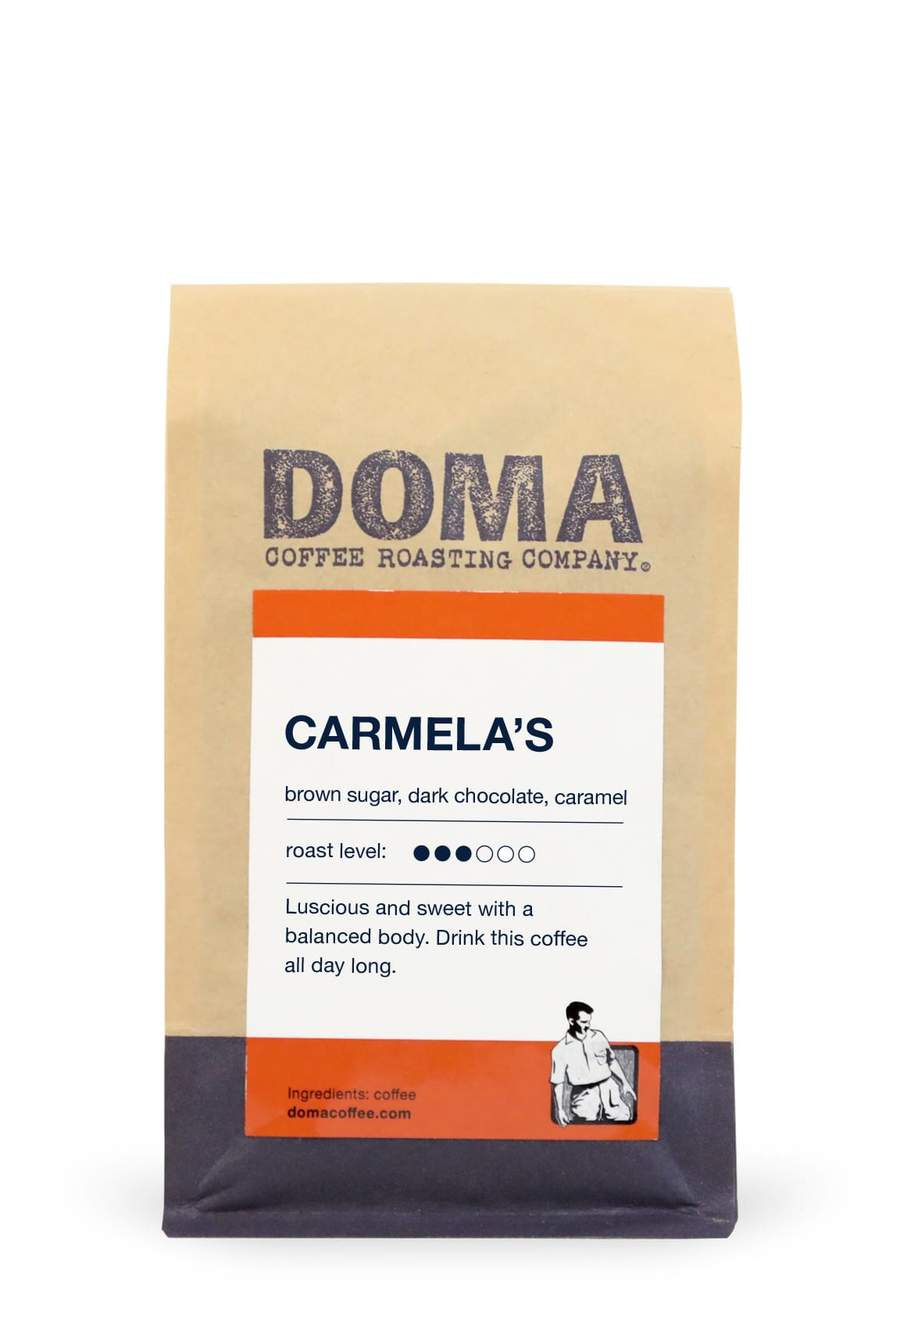 Carmela's Blend | Doma Coffee Roasting Company